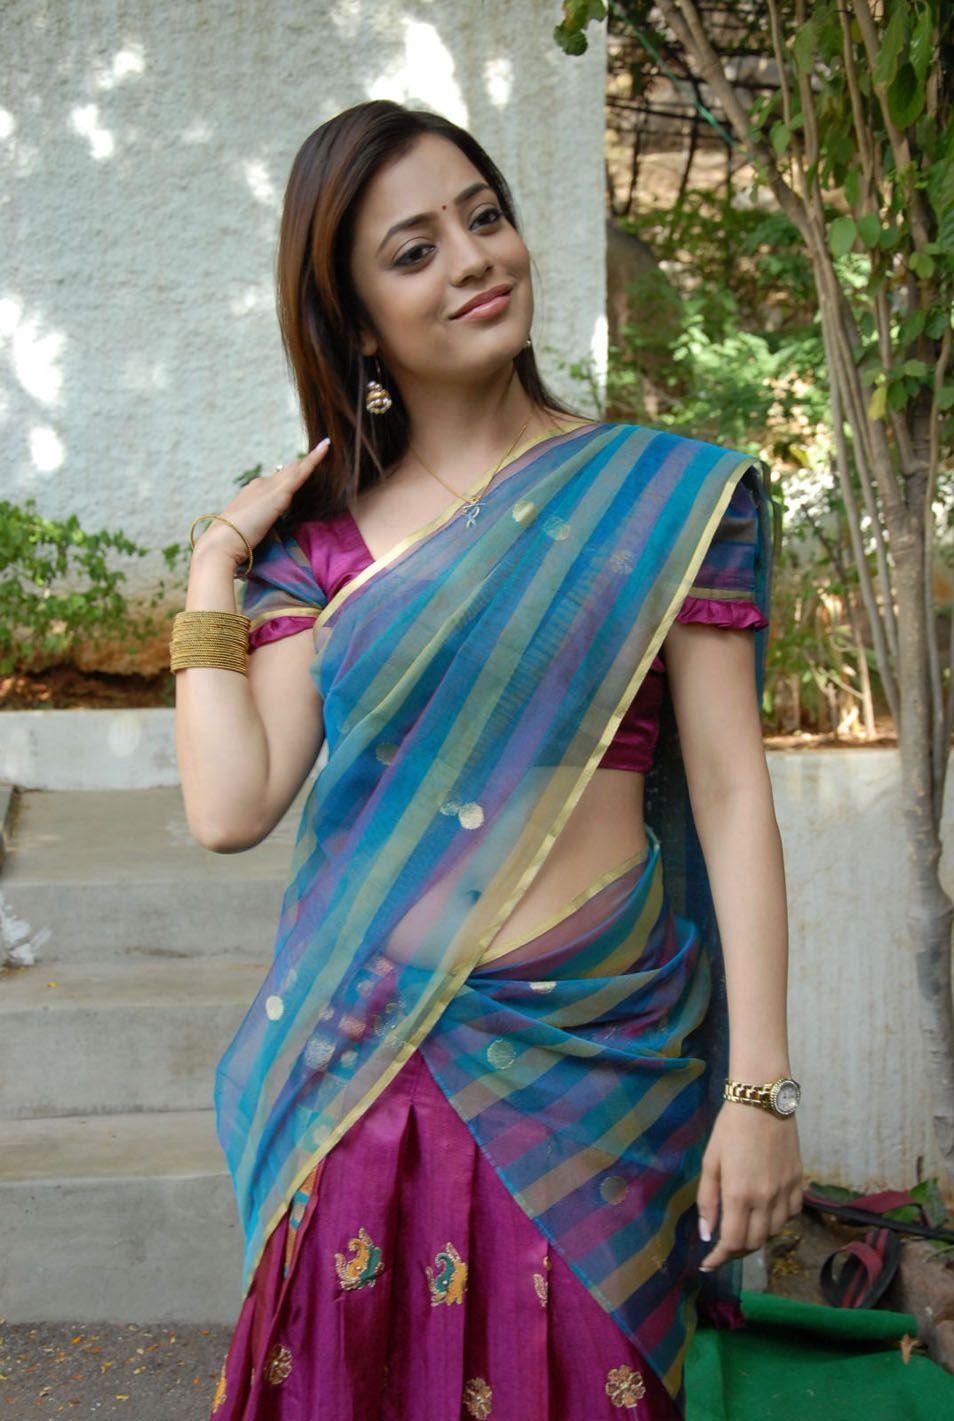 Image Result For Radhika Pandit In Saree